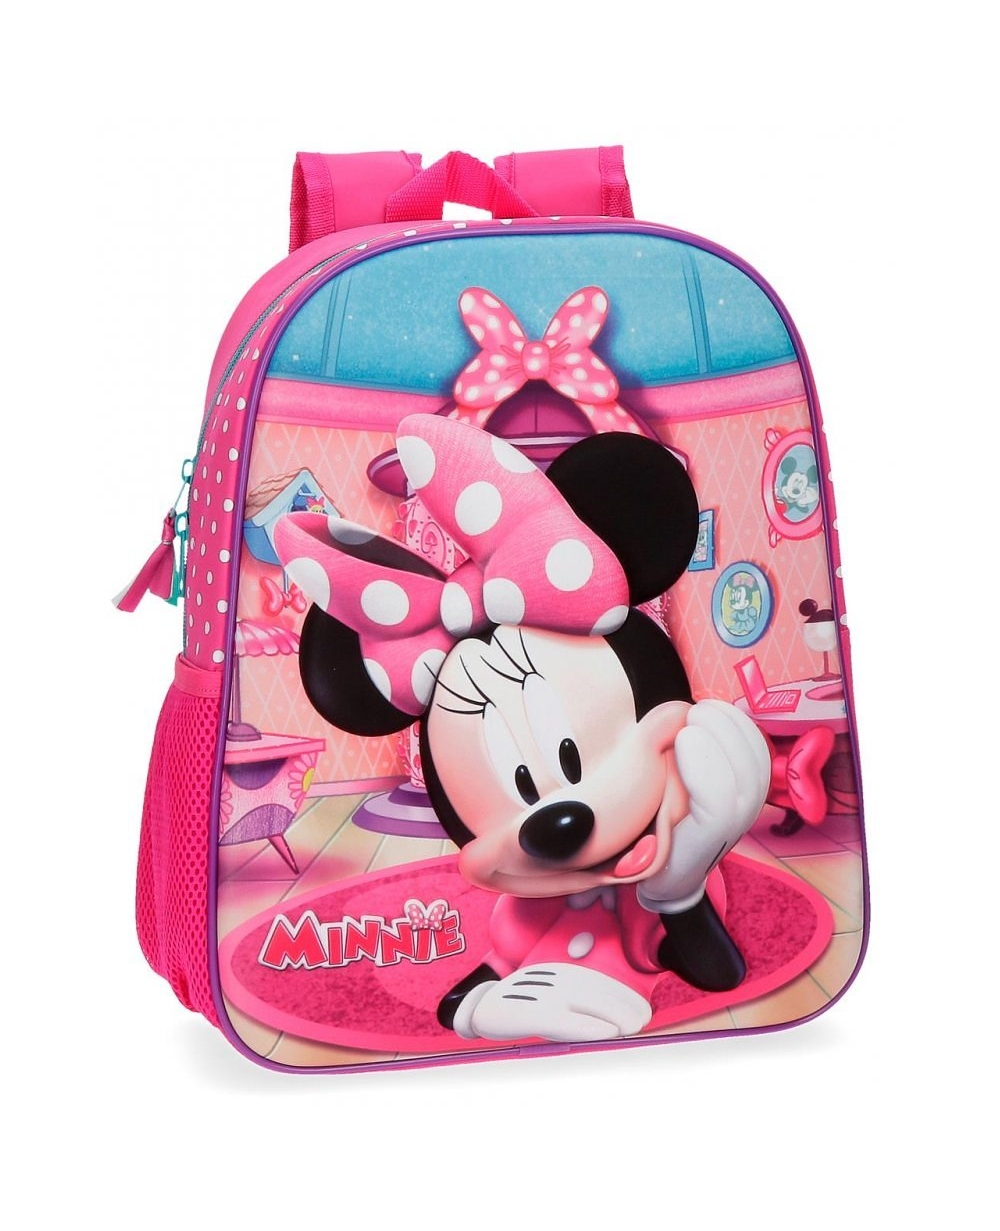 ddfe539b9 Mochila preescolar Minnie Smile frontal 3D Minnie Mouse Rosa 33cm ...